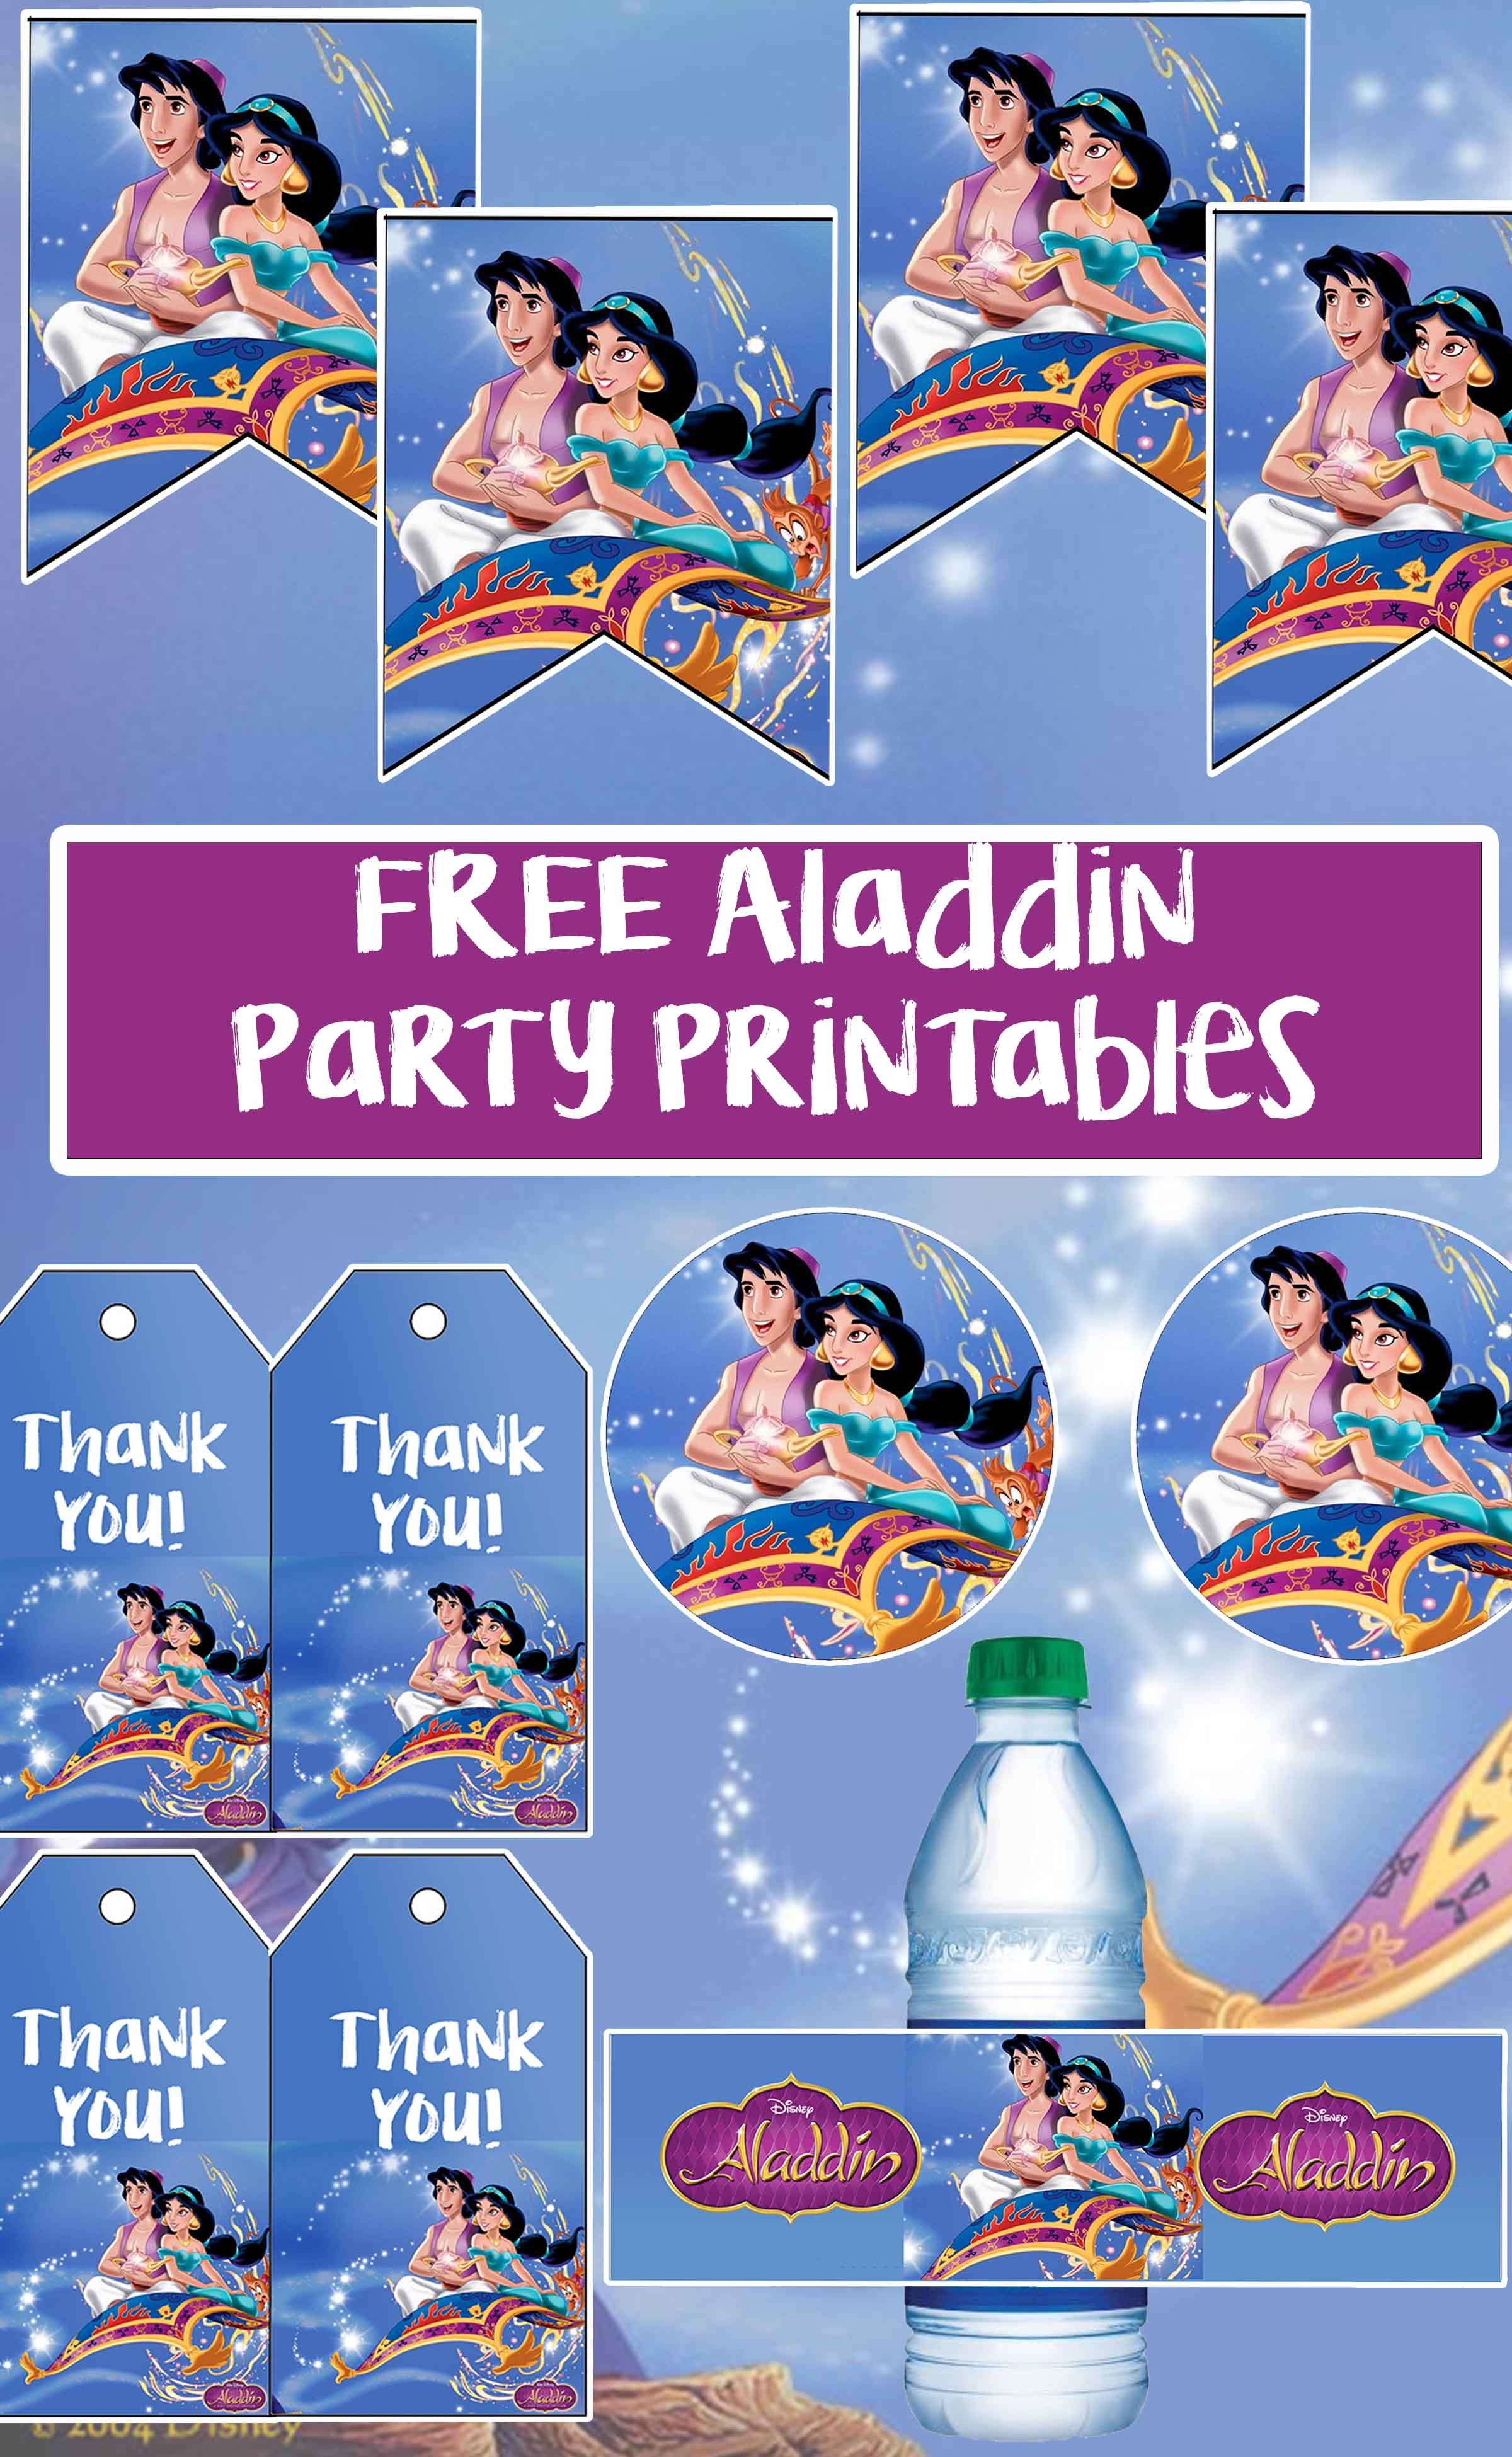 Aladdin Birthday Party Printable Files Aladdin Birthday Party Aladdin Party Princess Jasmine Birthday Party